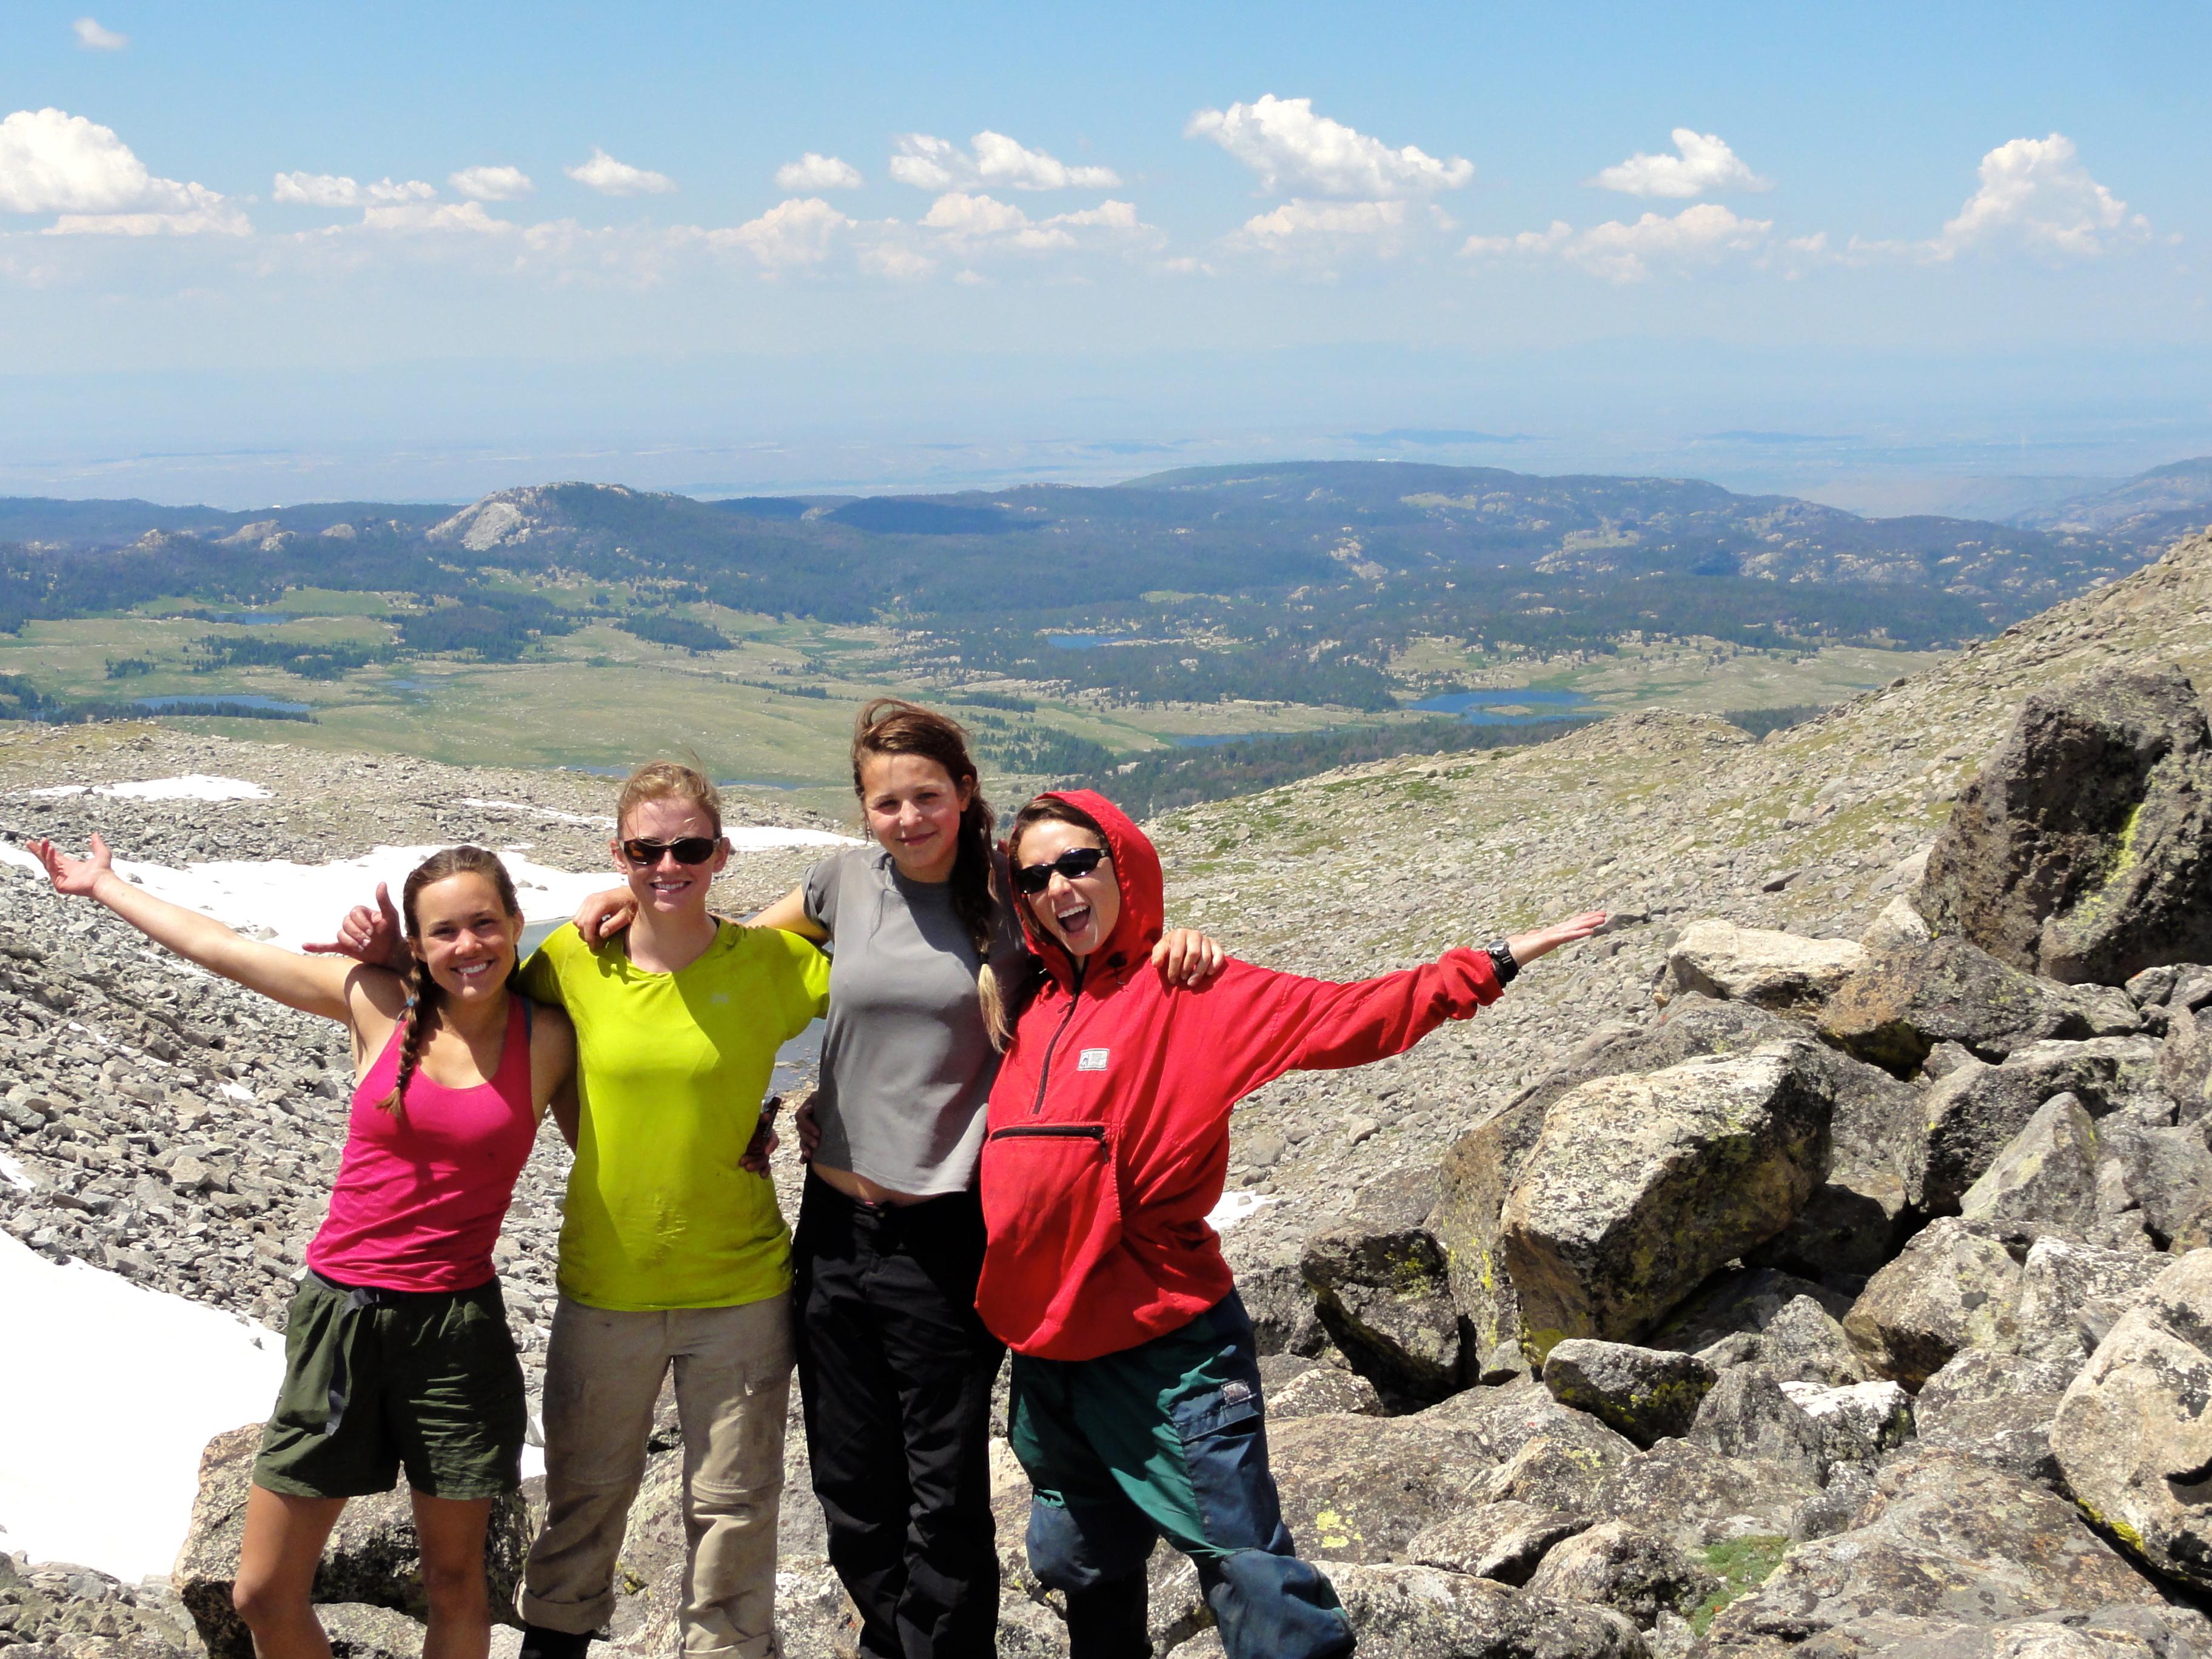 Summer Program - Hiking | NOLS Idaho Girls Backpacking Adventure